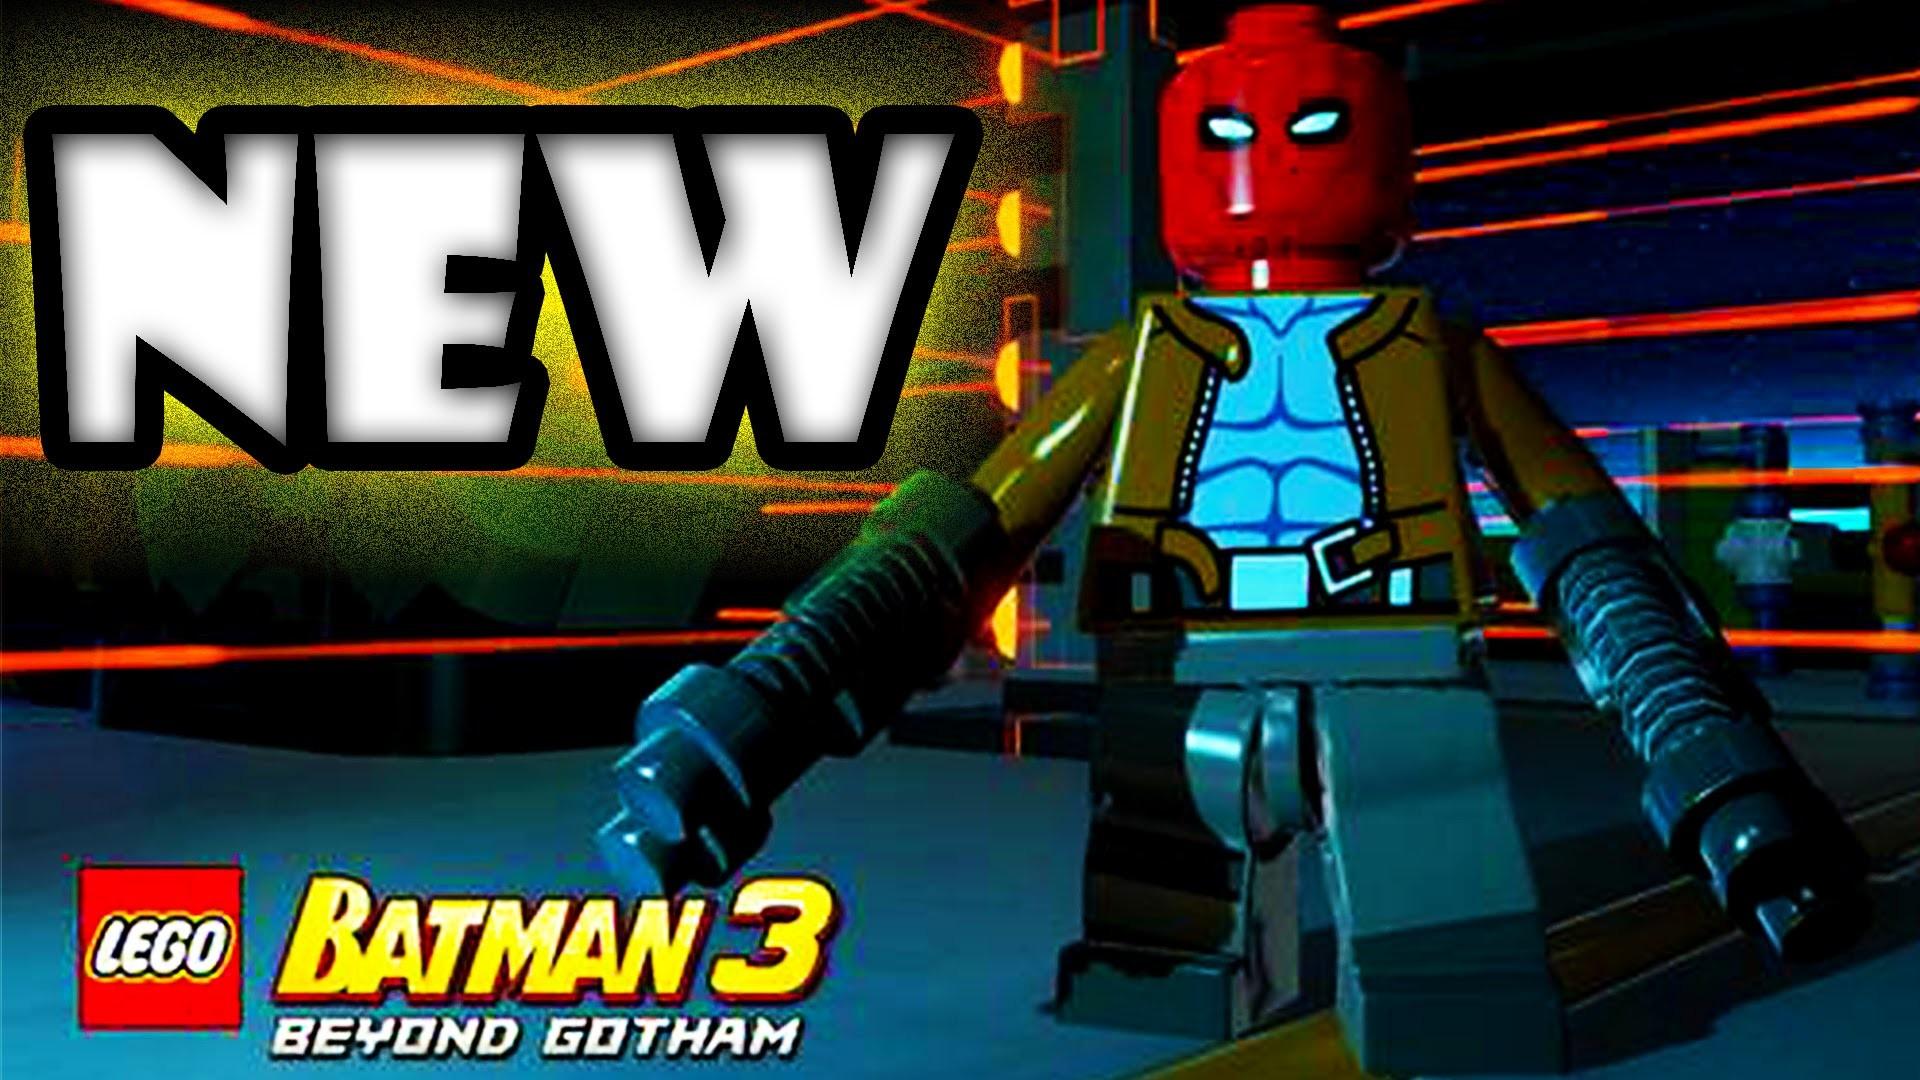 LEGO Batman 3 Red Hood Jason Todd! & Red Brick Idea? | Character Reveal  Countdown 4 – Beyond Gotham – YouTube